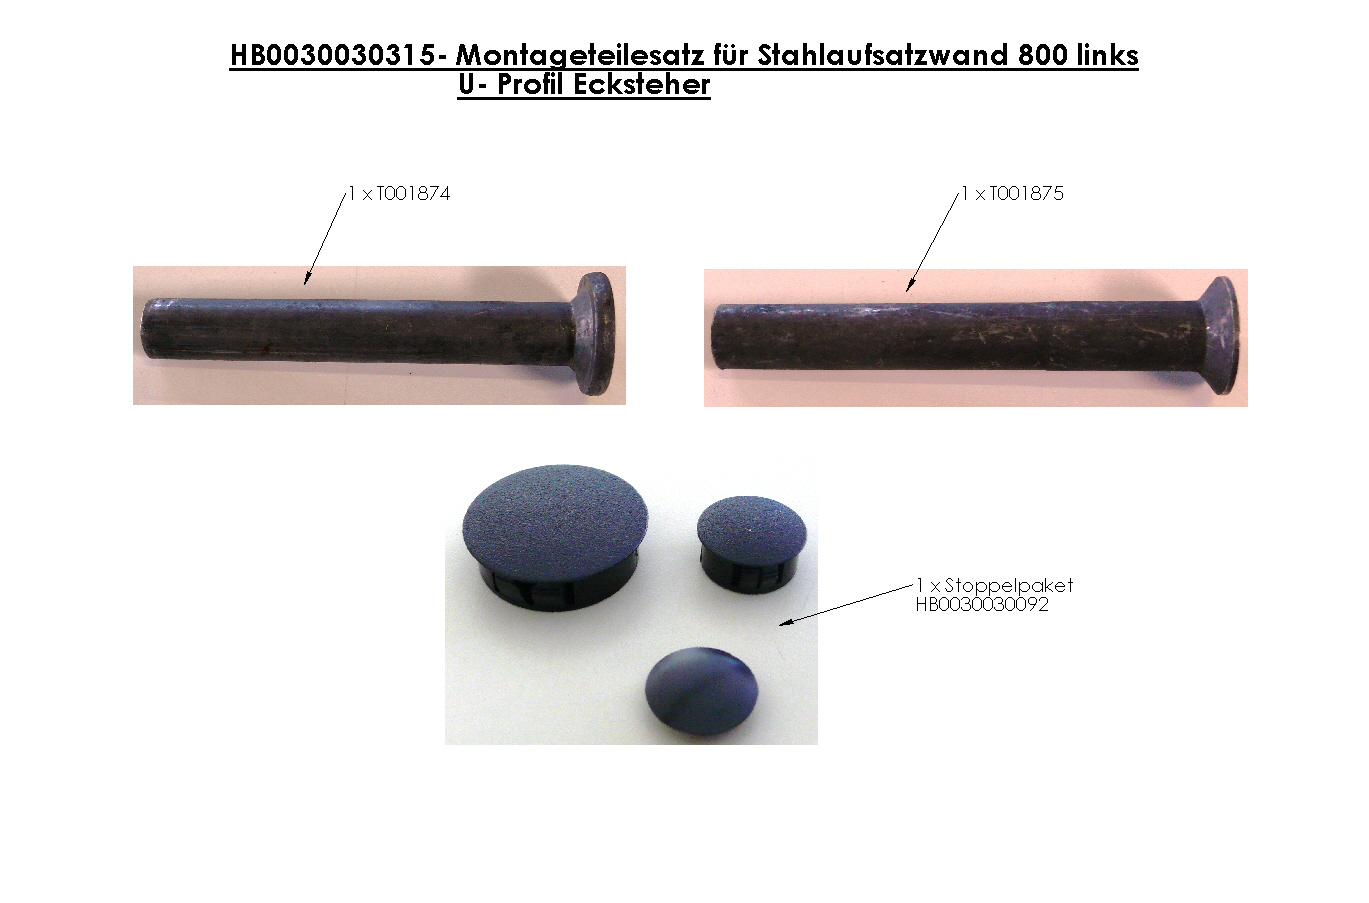 Brantner Kipper und Anhänger - assembly kit for steel attachment wall 800 left